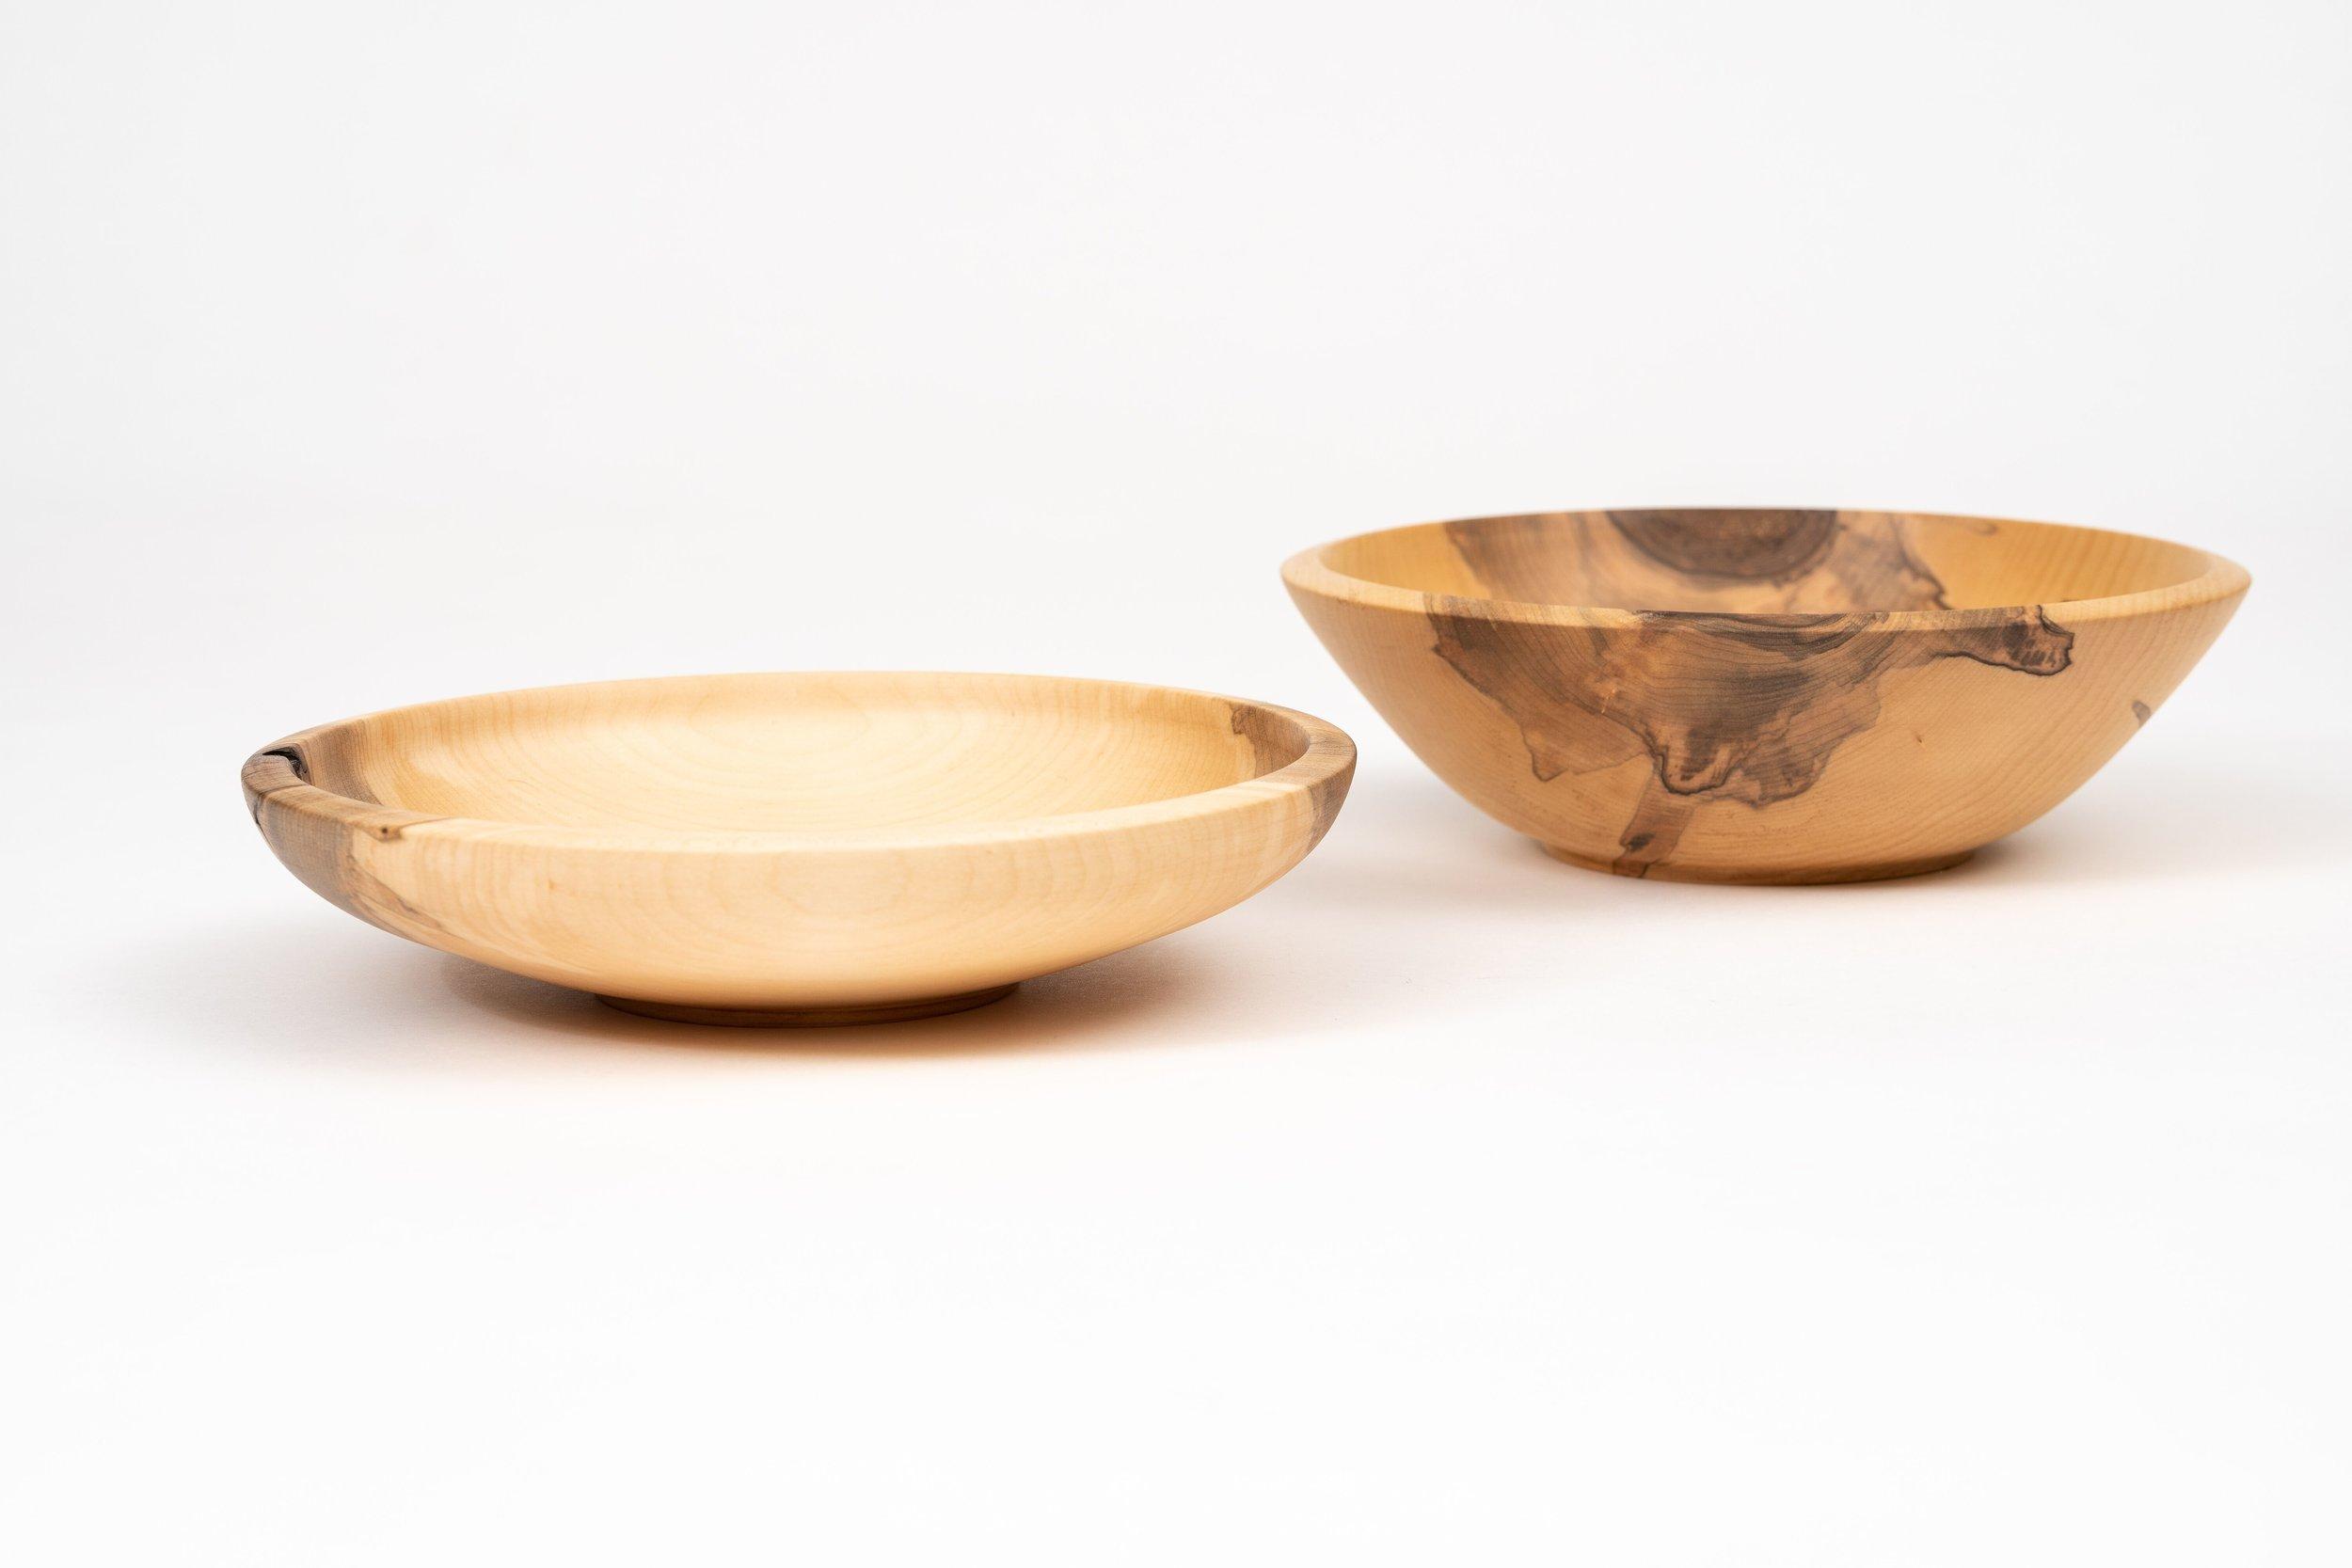 ambrosia-maple-wooden-bowl-dean-babin.jpeg